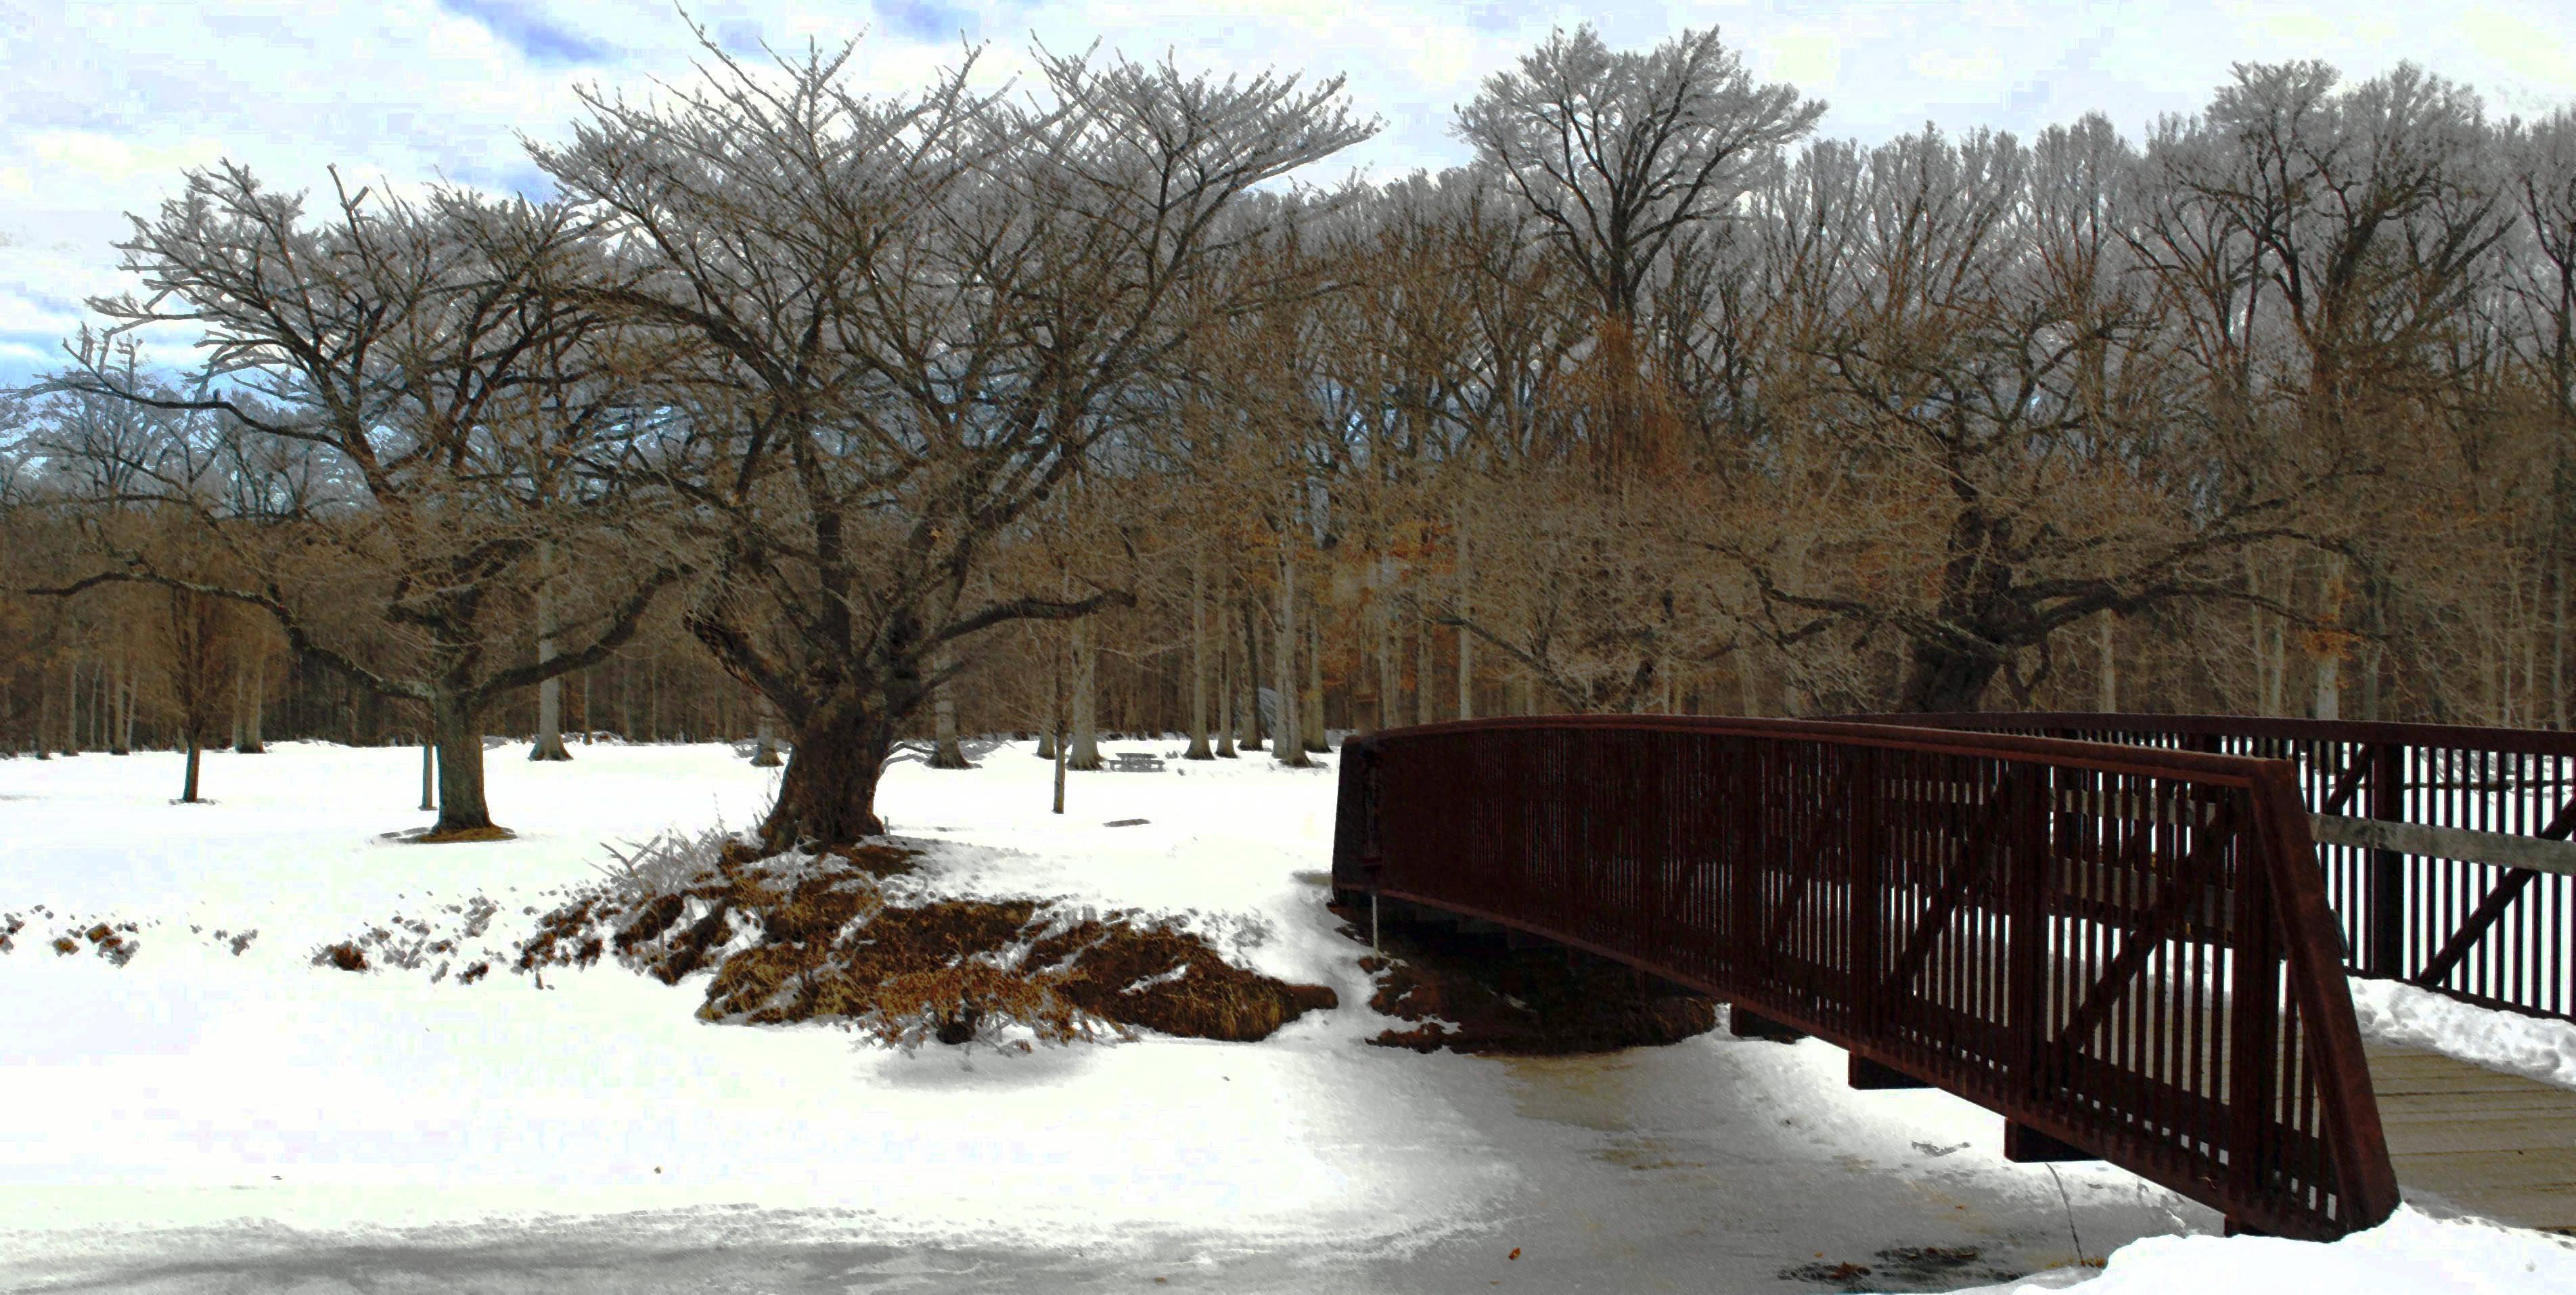 1d1552bb8718274c5f57_Winter_Nomahega_Bridge_2_2.jpg